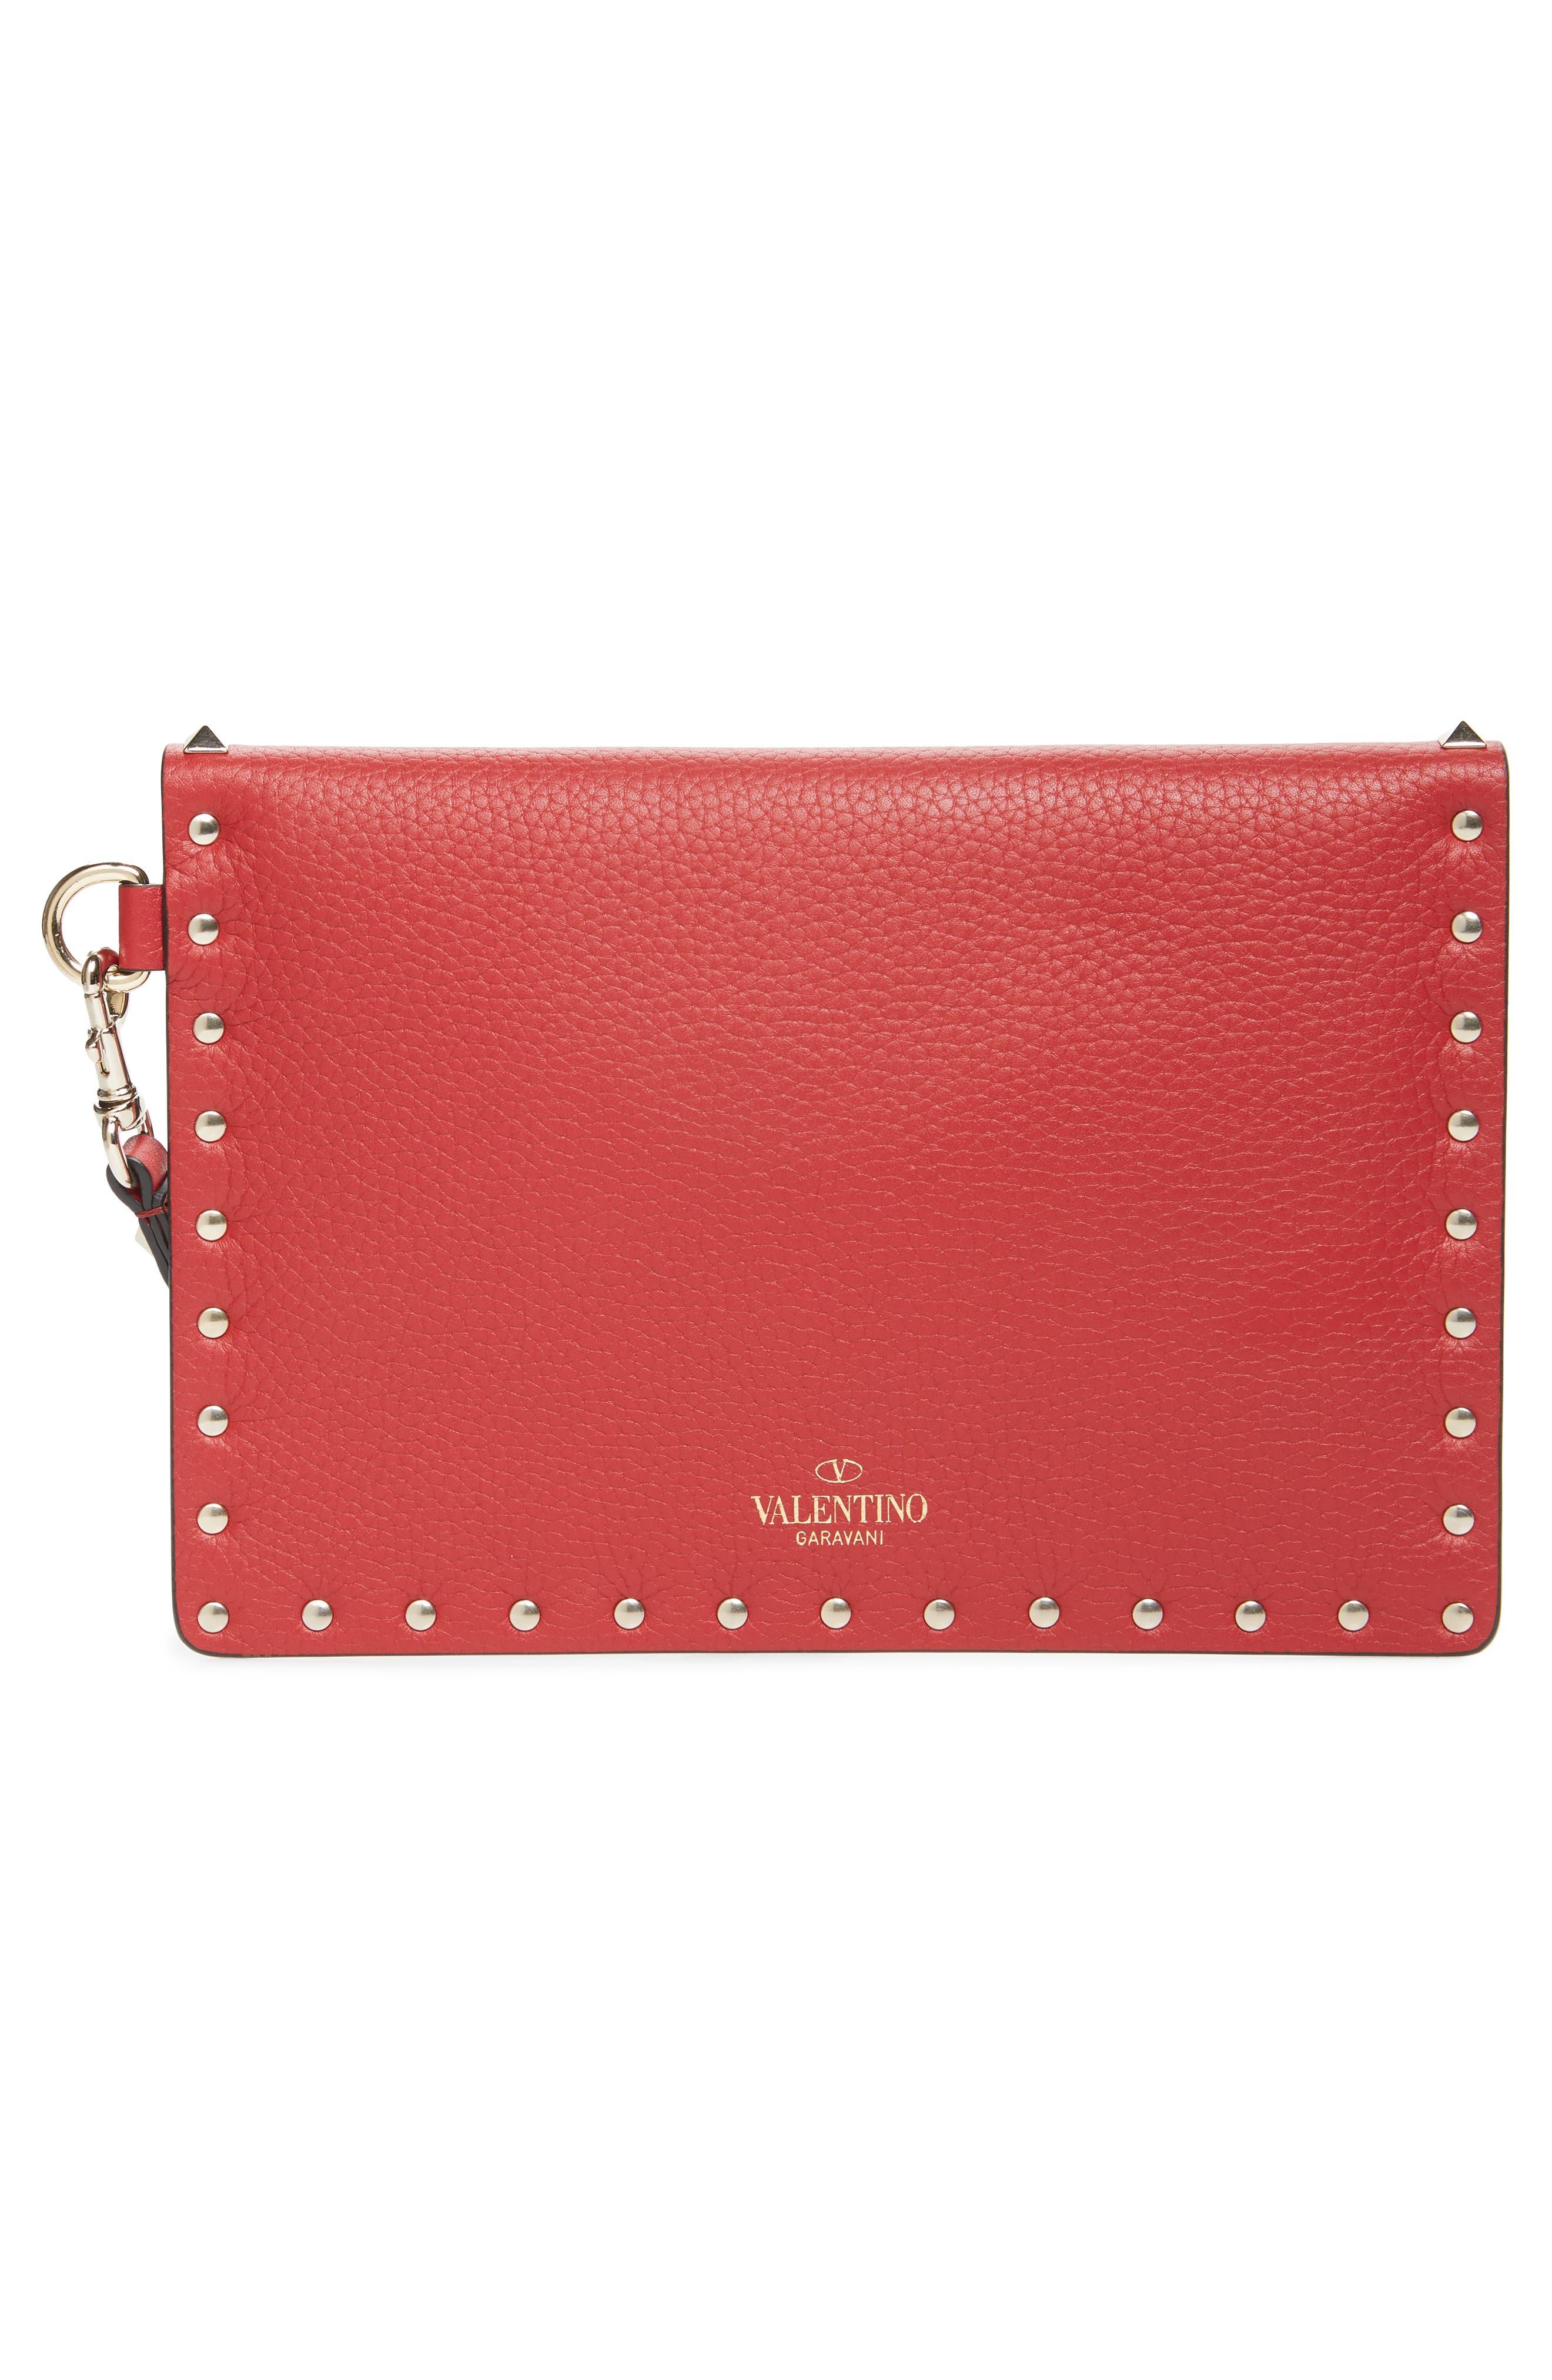 Medium Rockstud Leather Envelope Pouch,                             Alternate thumbnail 3, color,                             ROSSO V